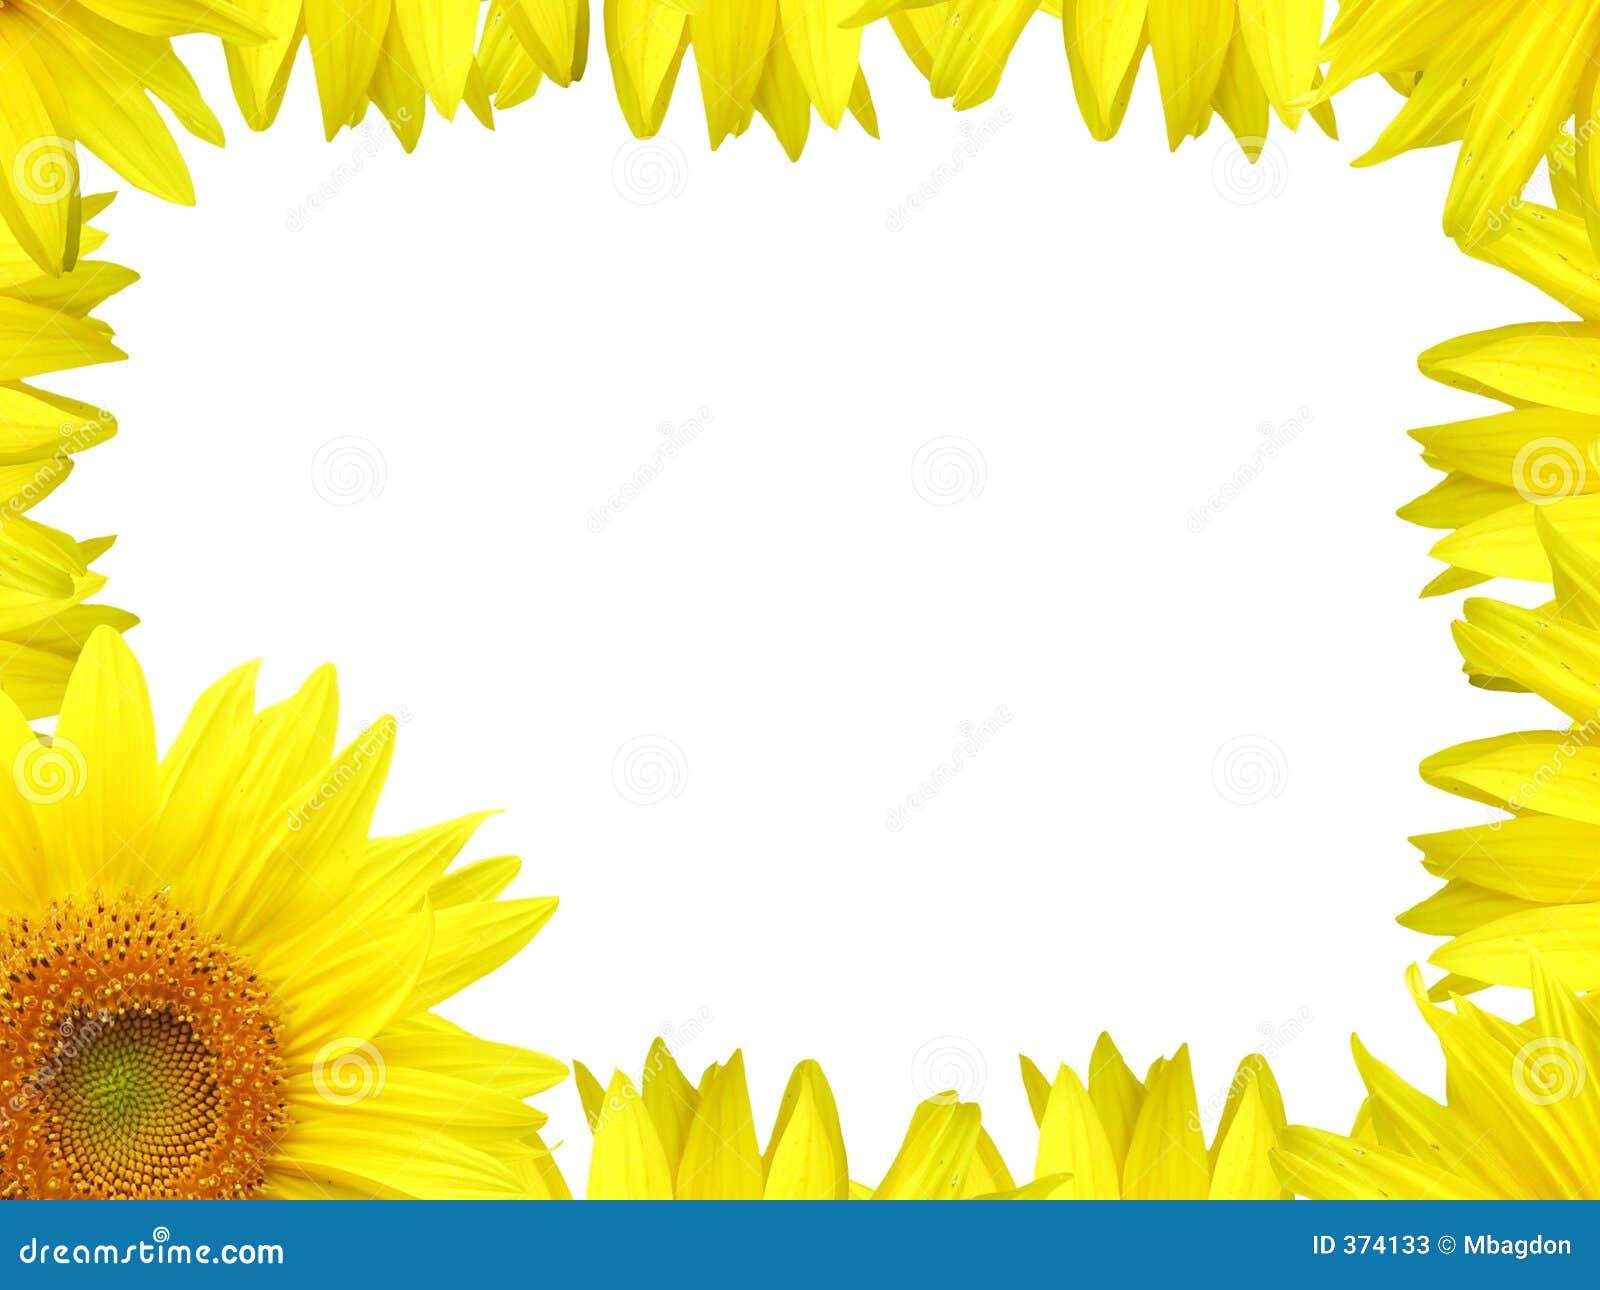 Stock Photos: Flower border